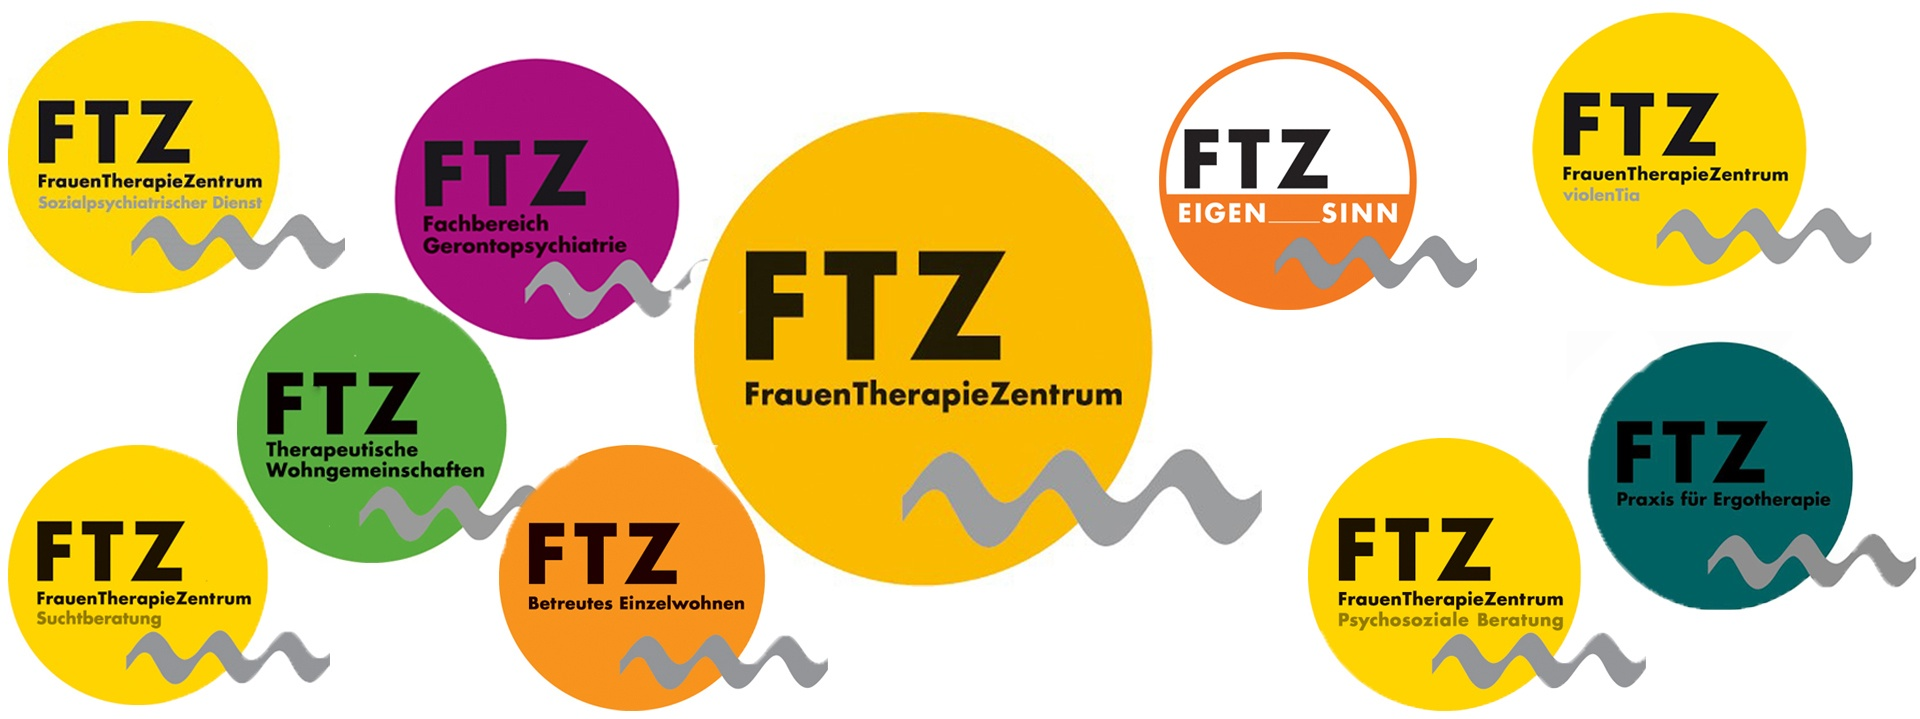 FTZ_Logos